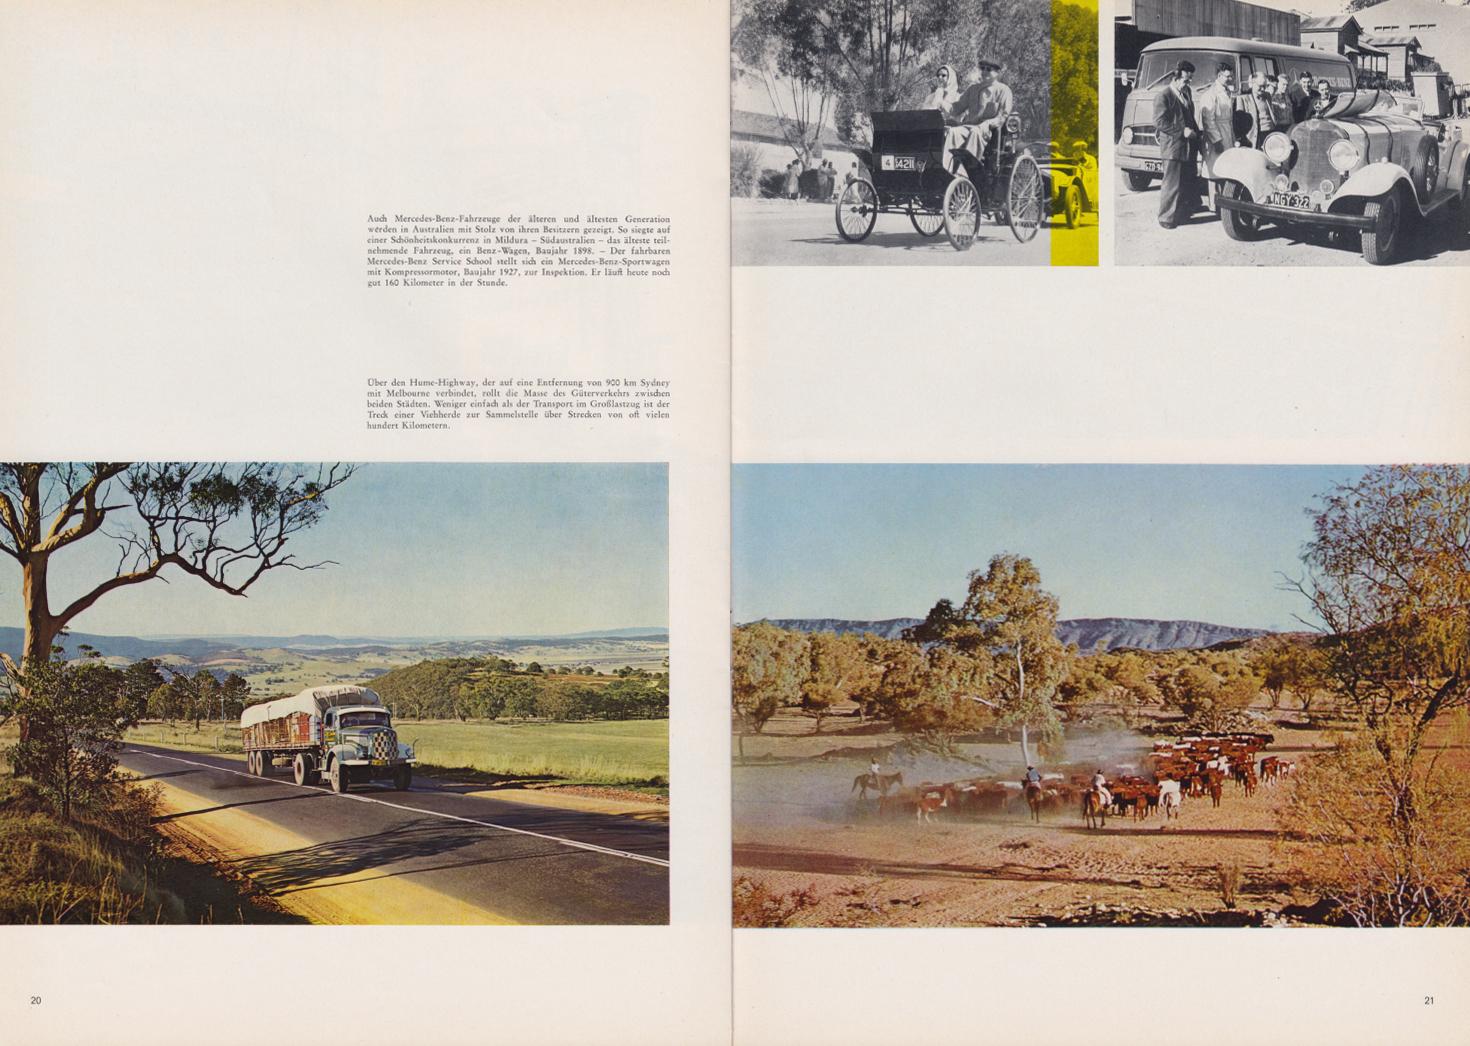 (REVISTA): Periódico In aller welt n.º 44 - Mercedes-Benz no mundo - 1960 - multilingue 011